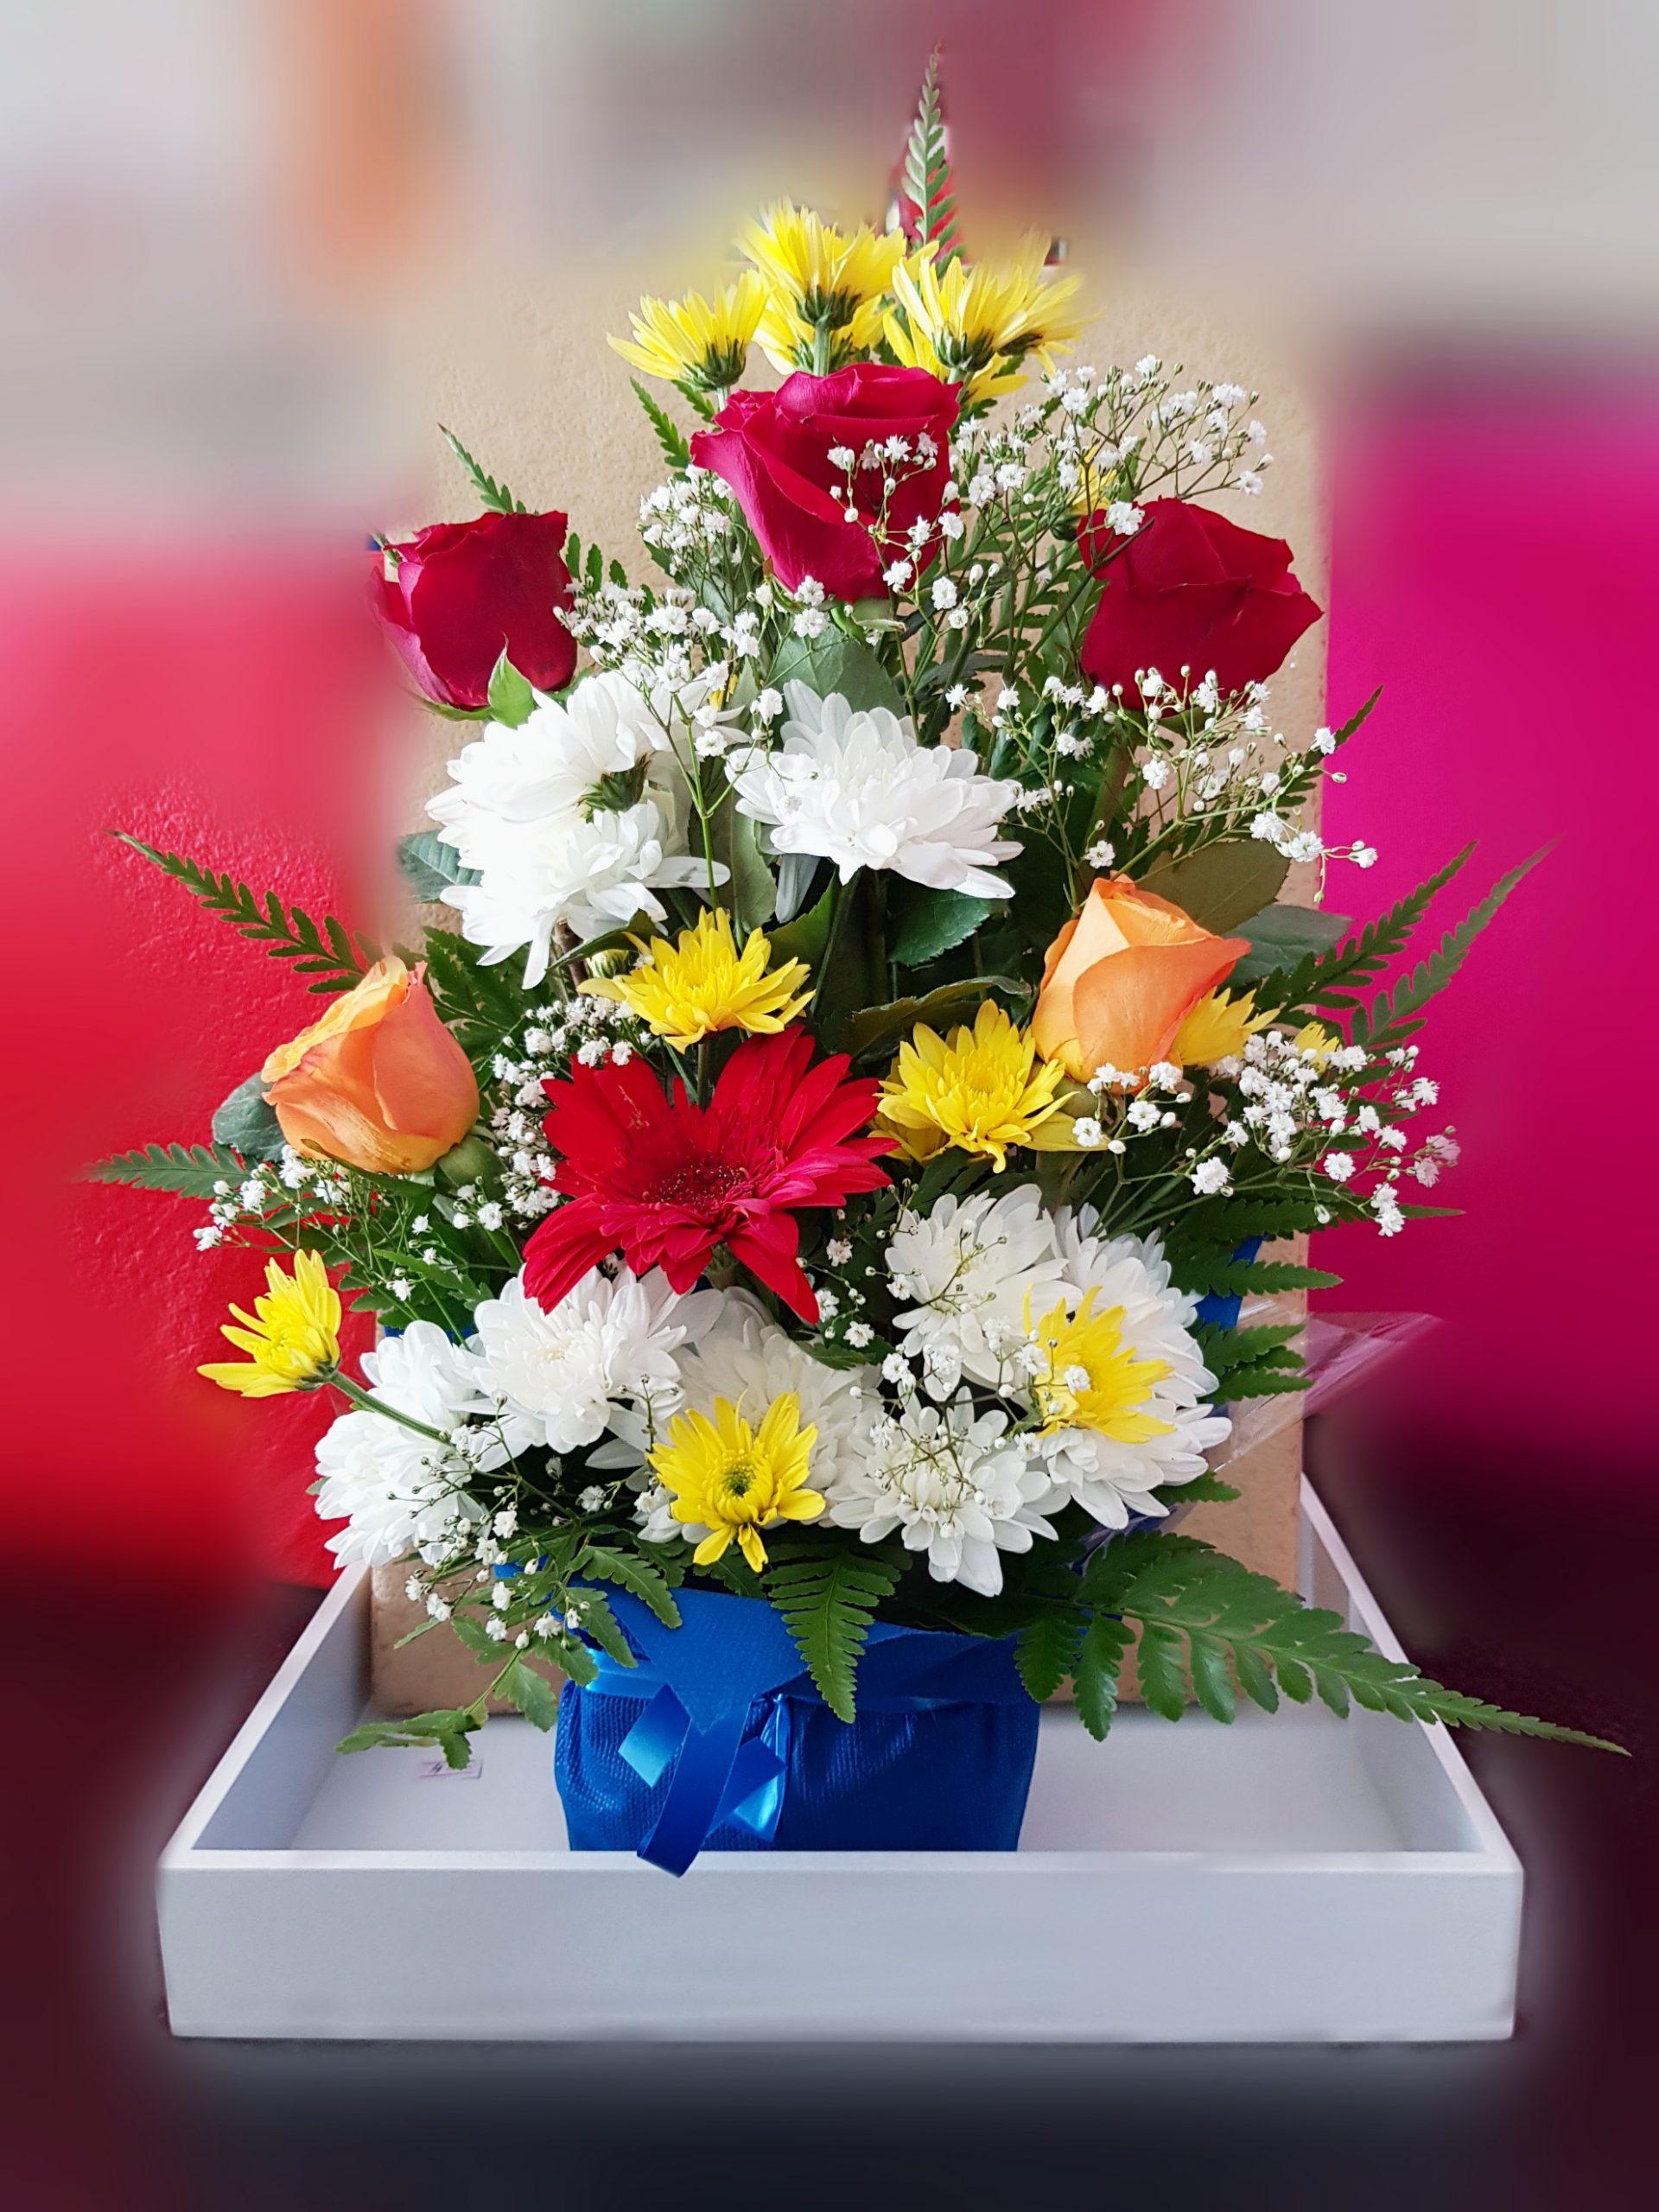 Exoticarrangement,flowerarrangement, mixedflowers,redroses,yellowroses,whiteroses,special,gift,present,onlineflowerdelivery